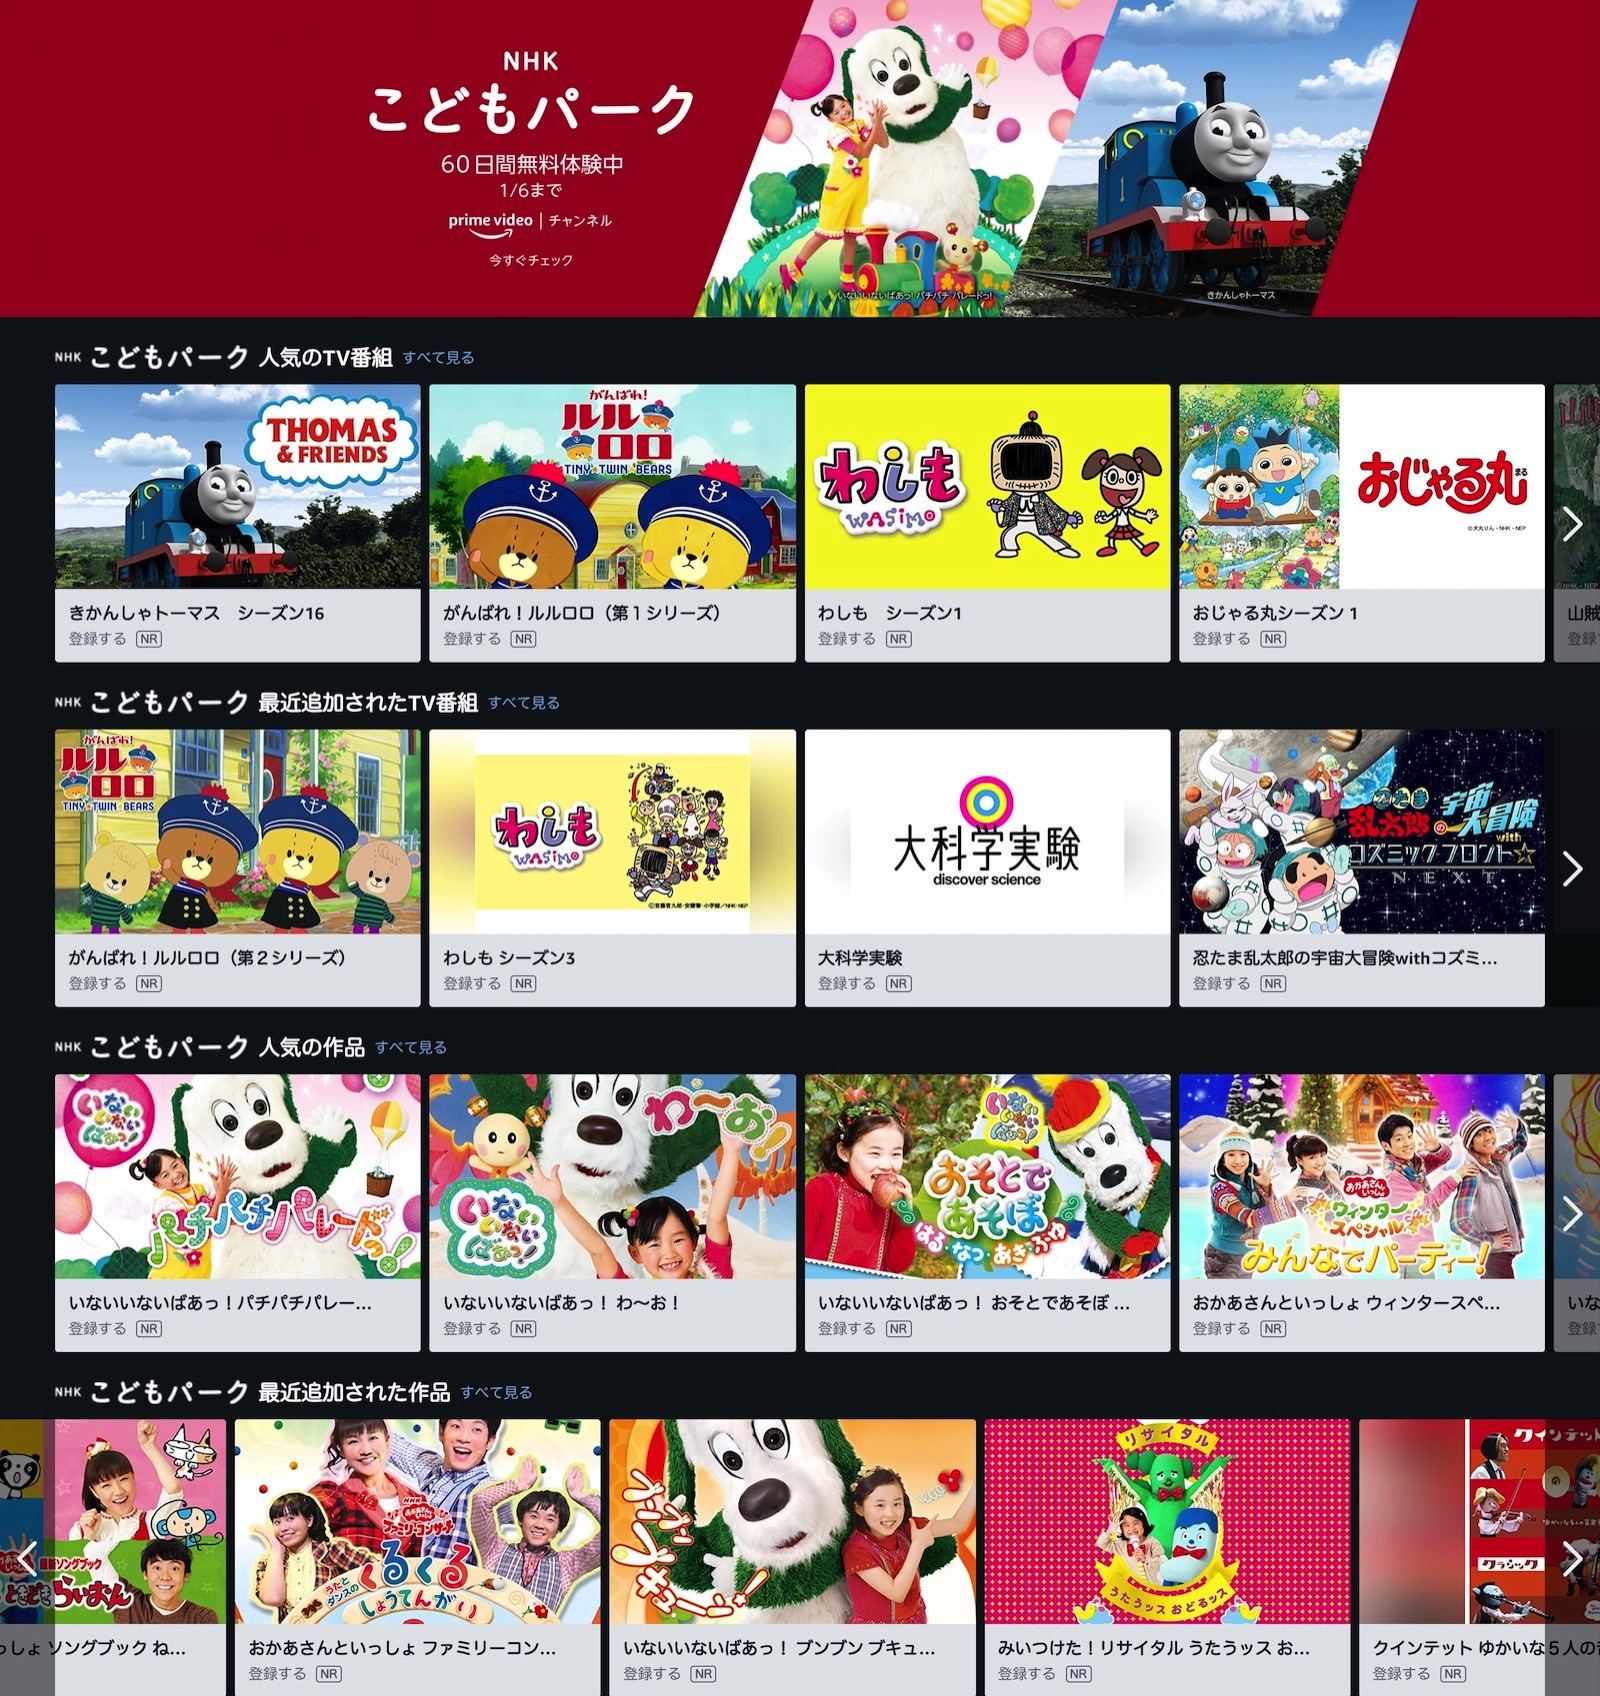 NHK Kids Park